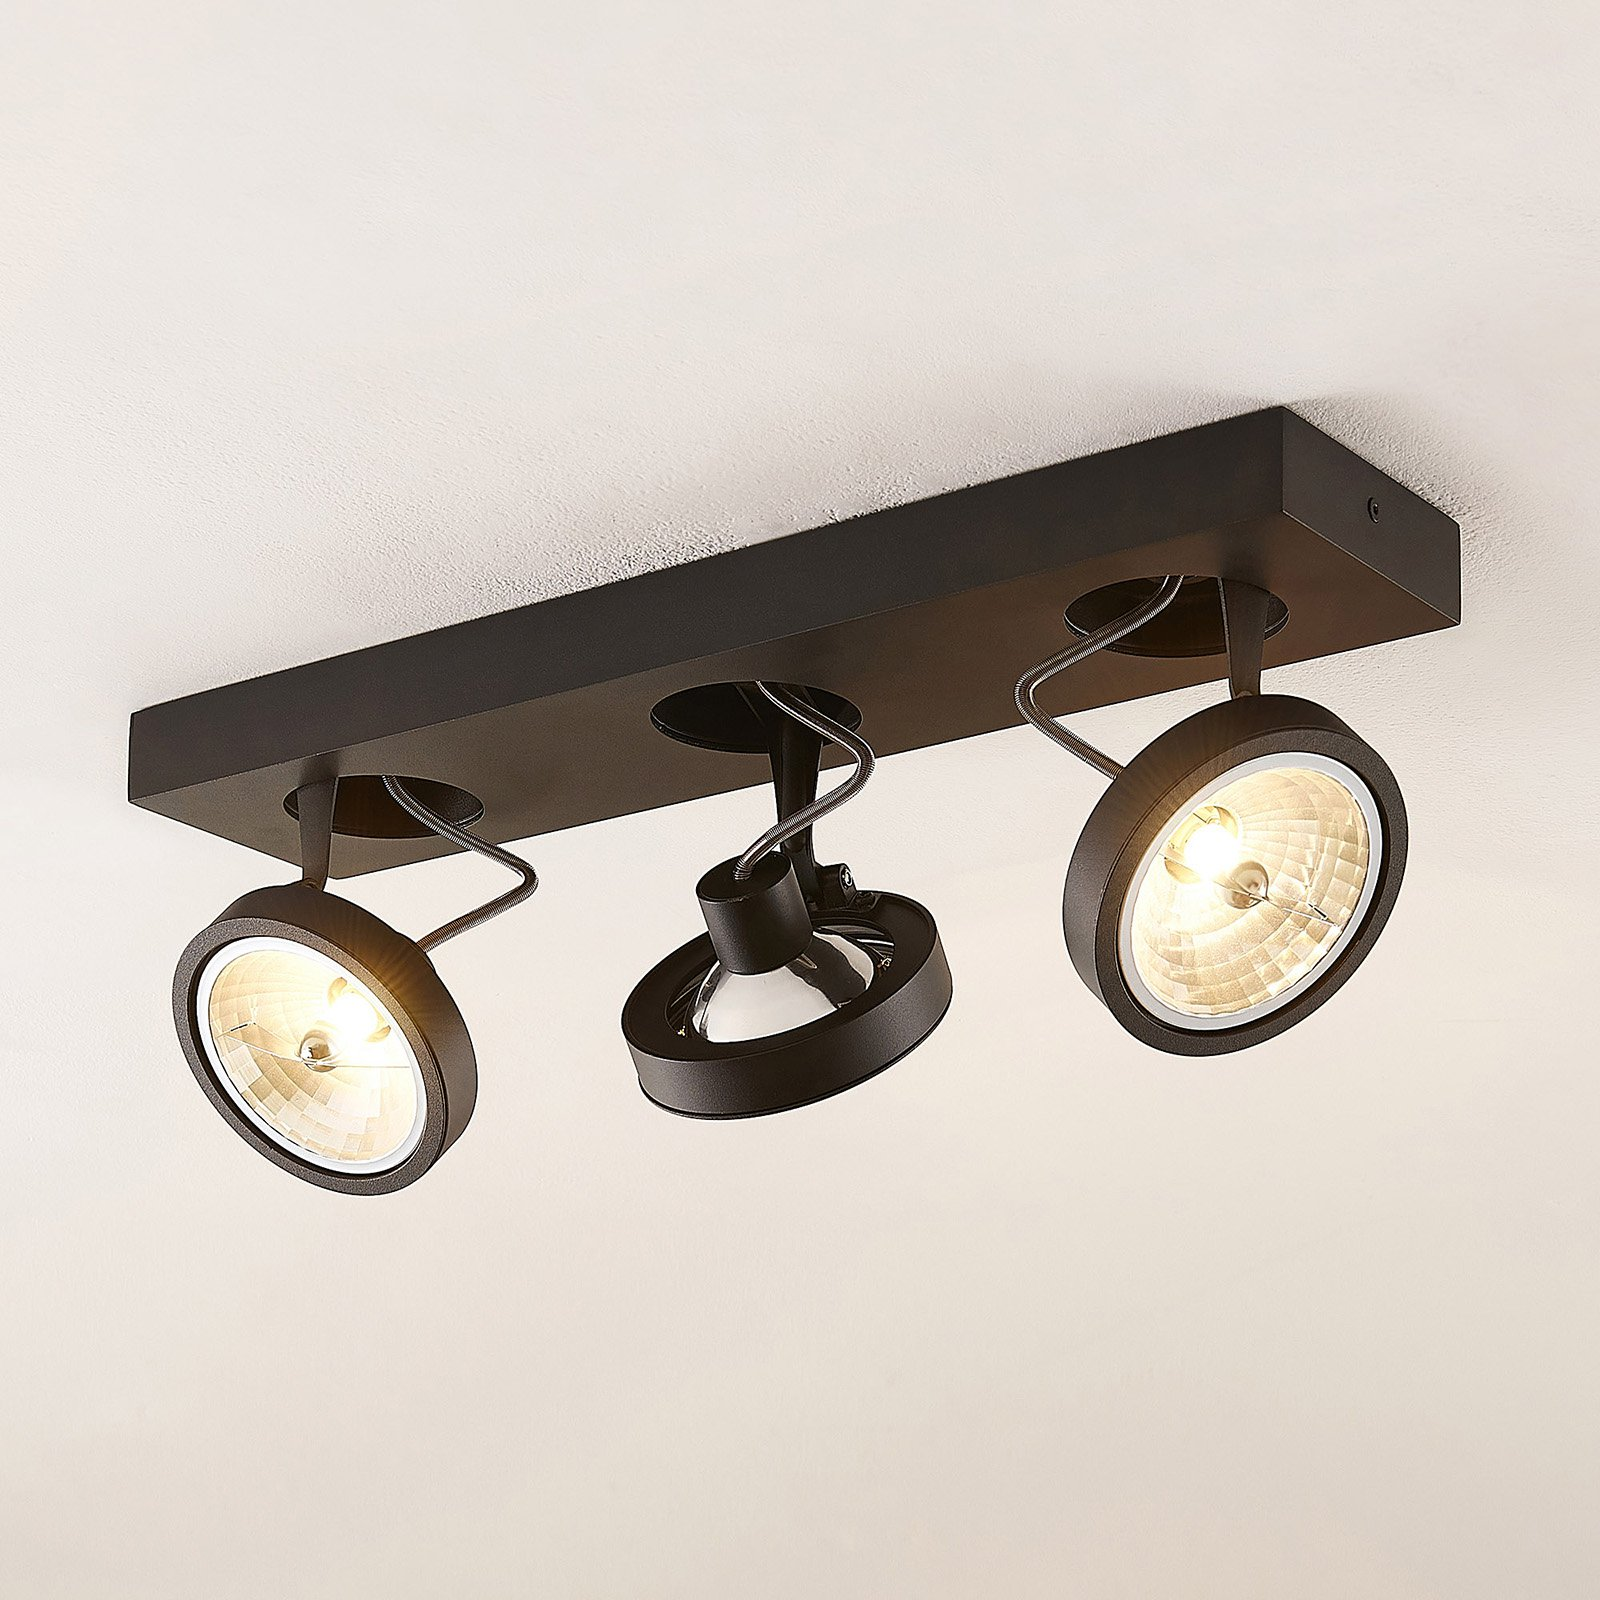 Arcchio Jorvin-taklampe, 3 lyskilder svart